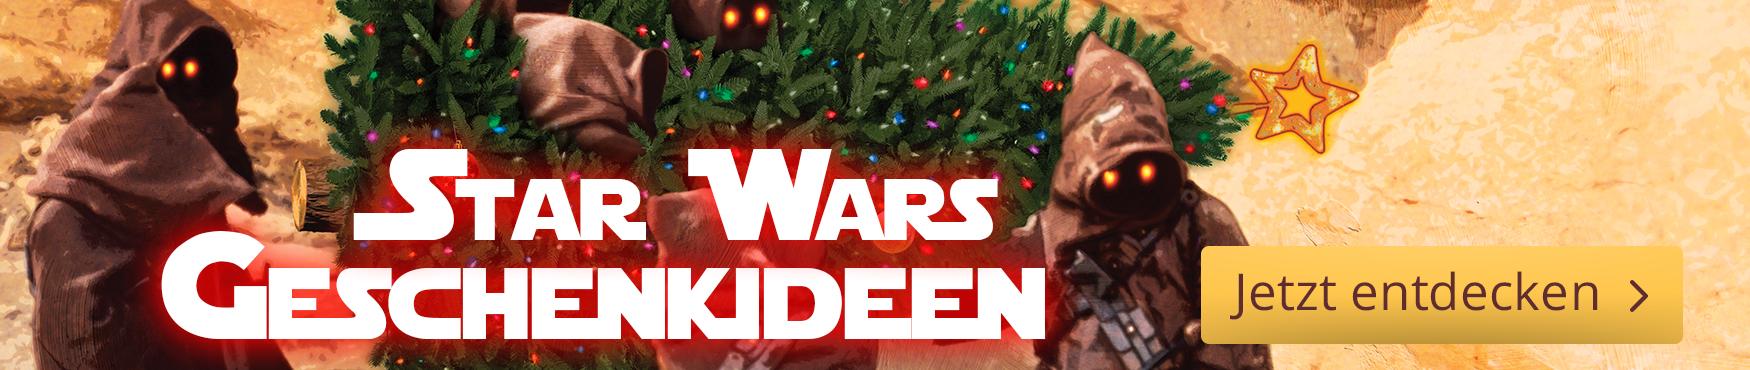 Star Wars - Geschenkideen